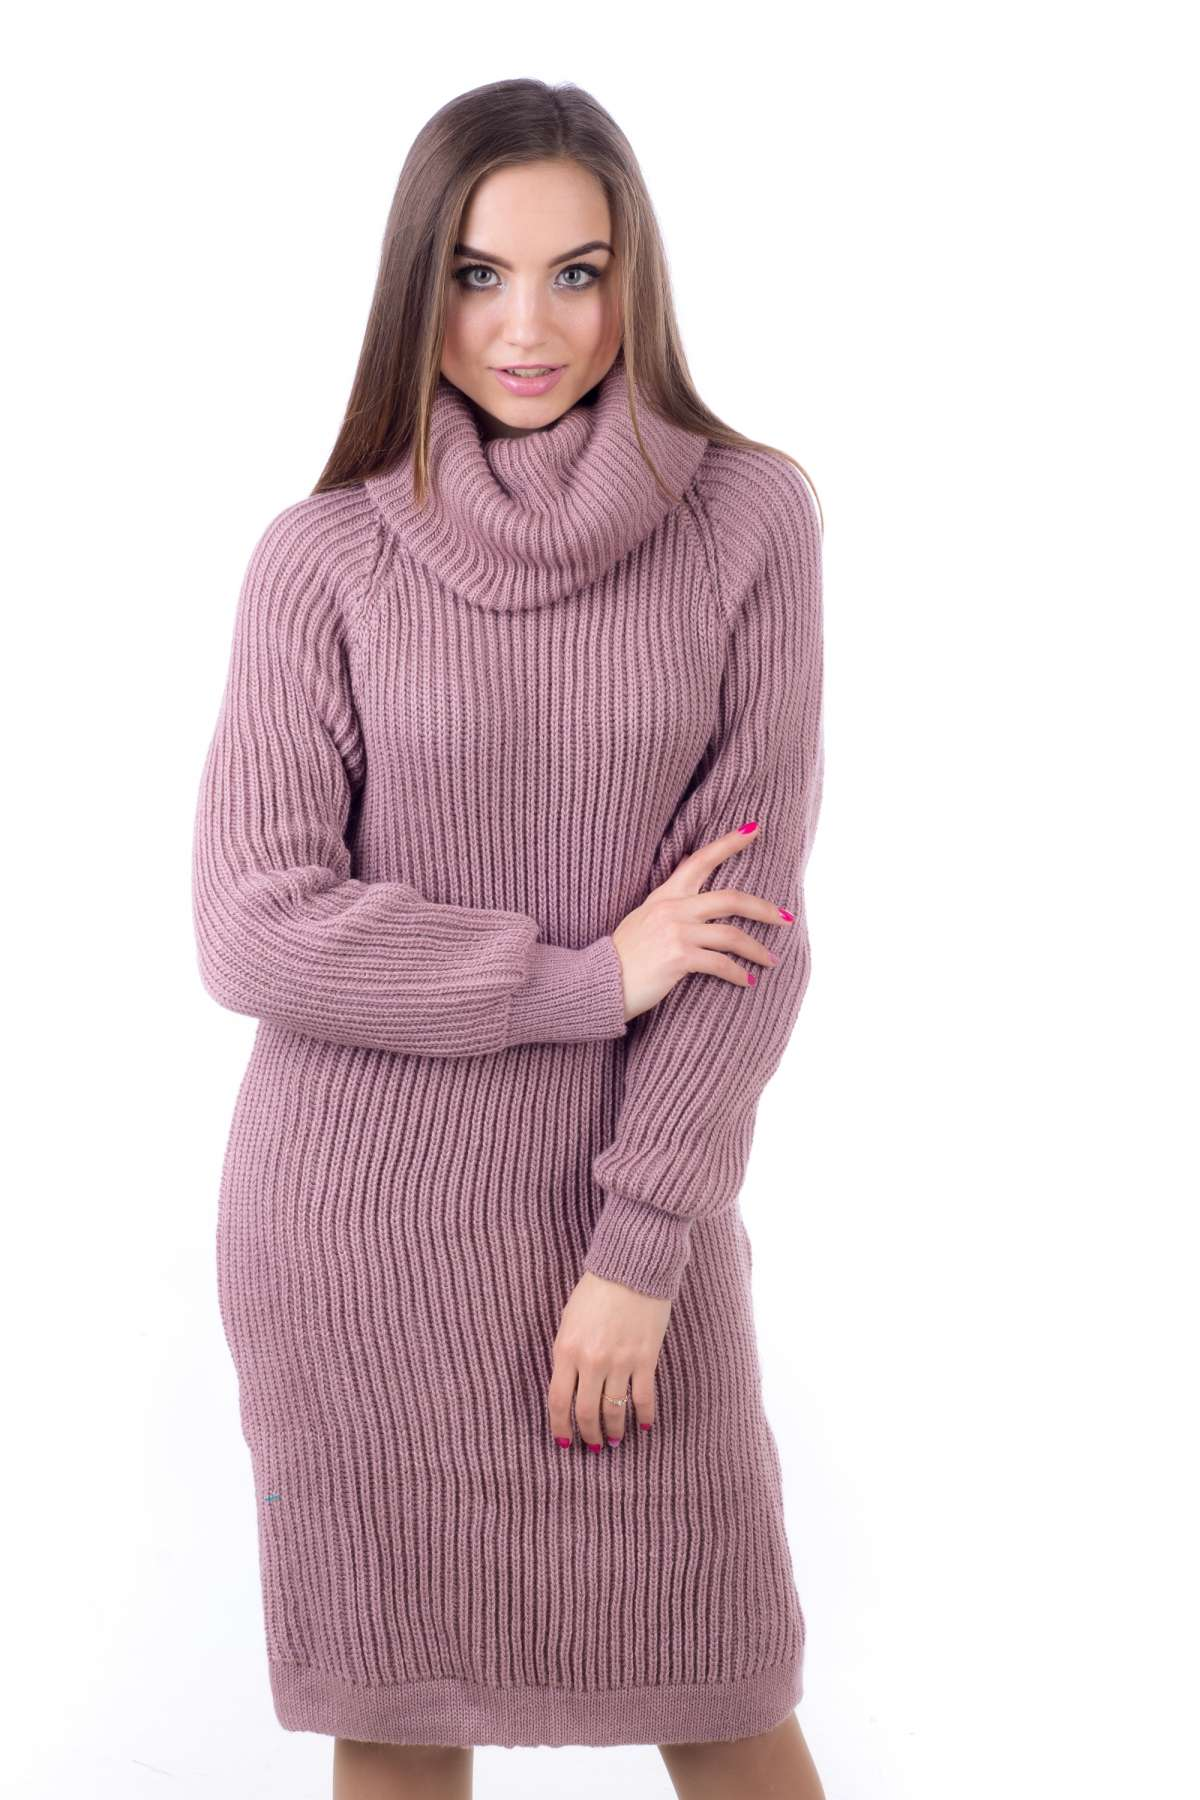 a5c9f74ad76 Теплое вязаное платье-свитер Ласка